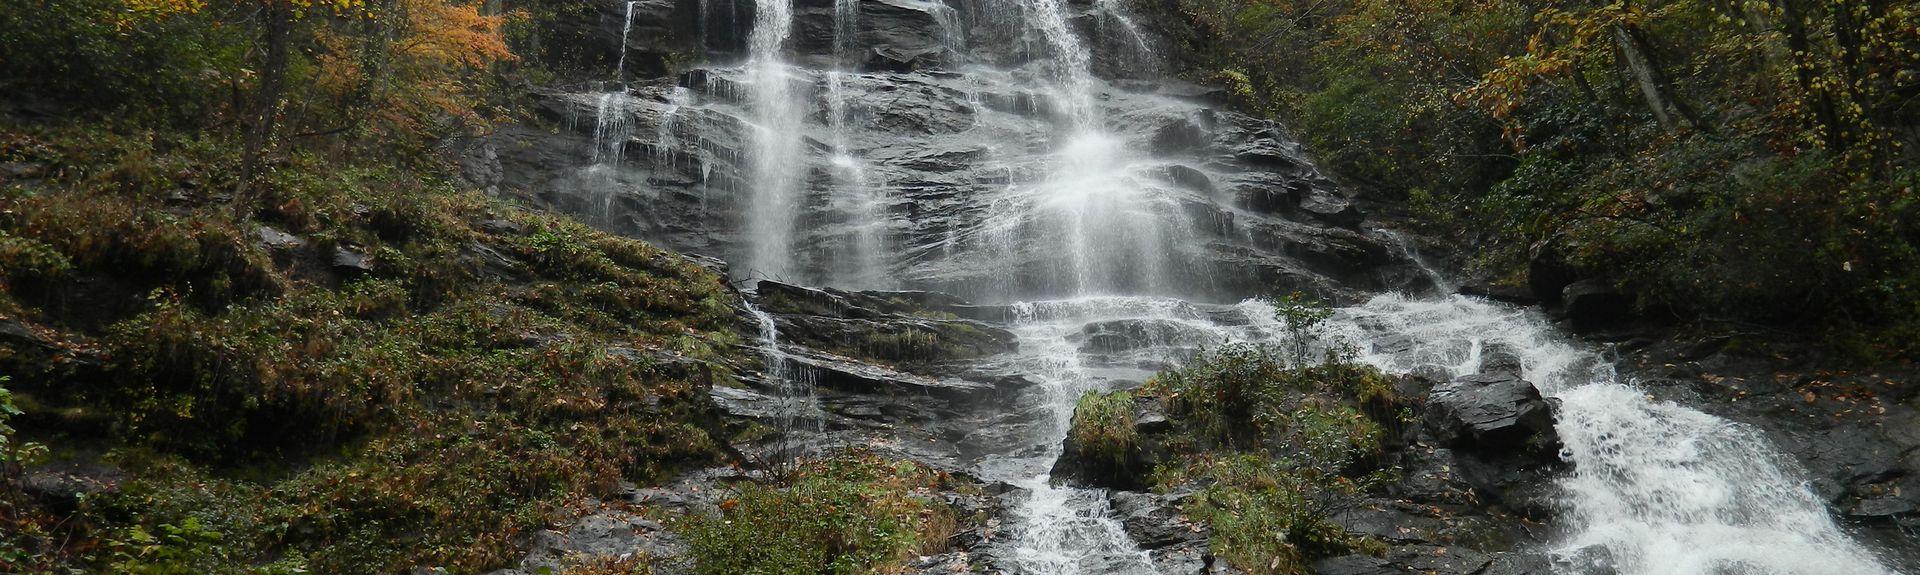 Sassafras Mountain, Dahlonega, Suches, Georgia, United States of America